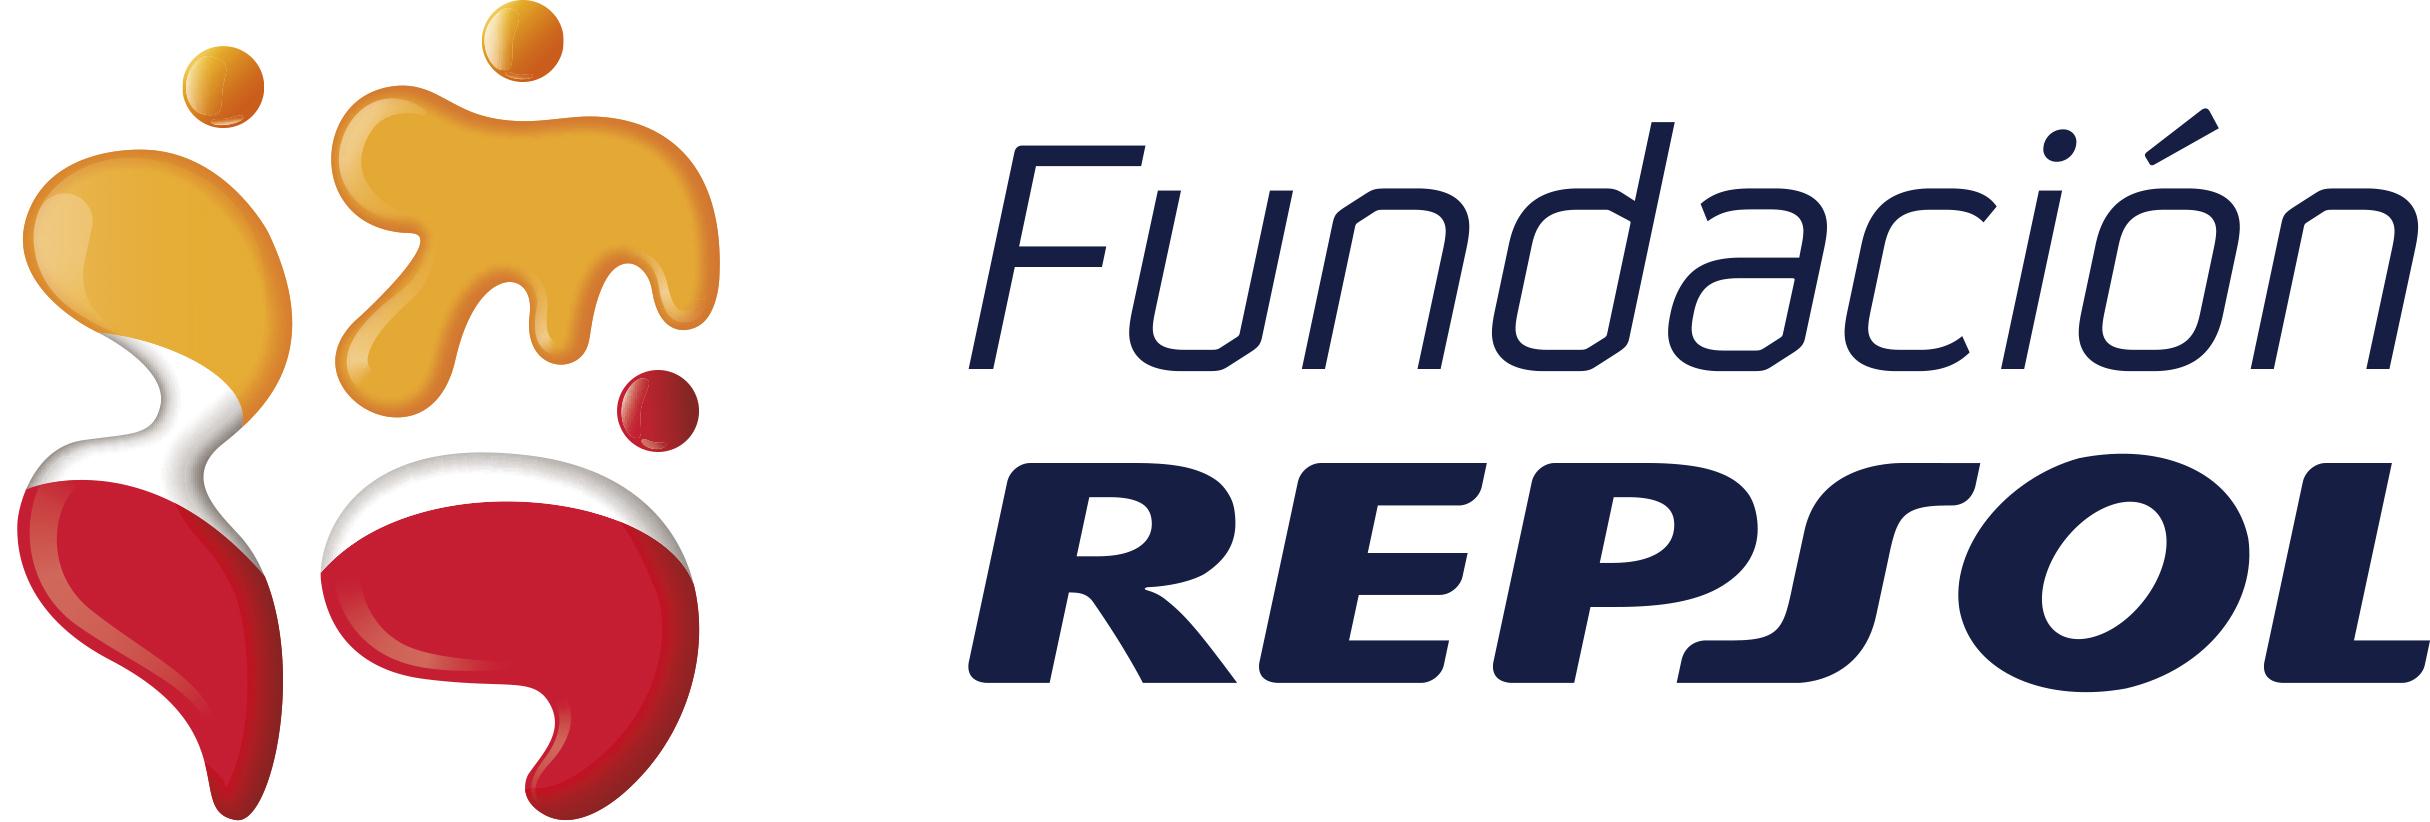 Fundacion Repsol LOGO